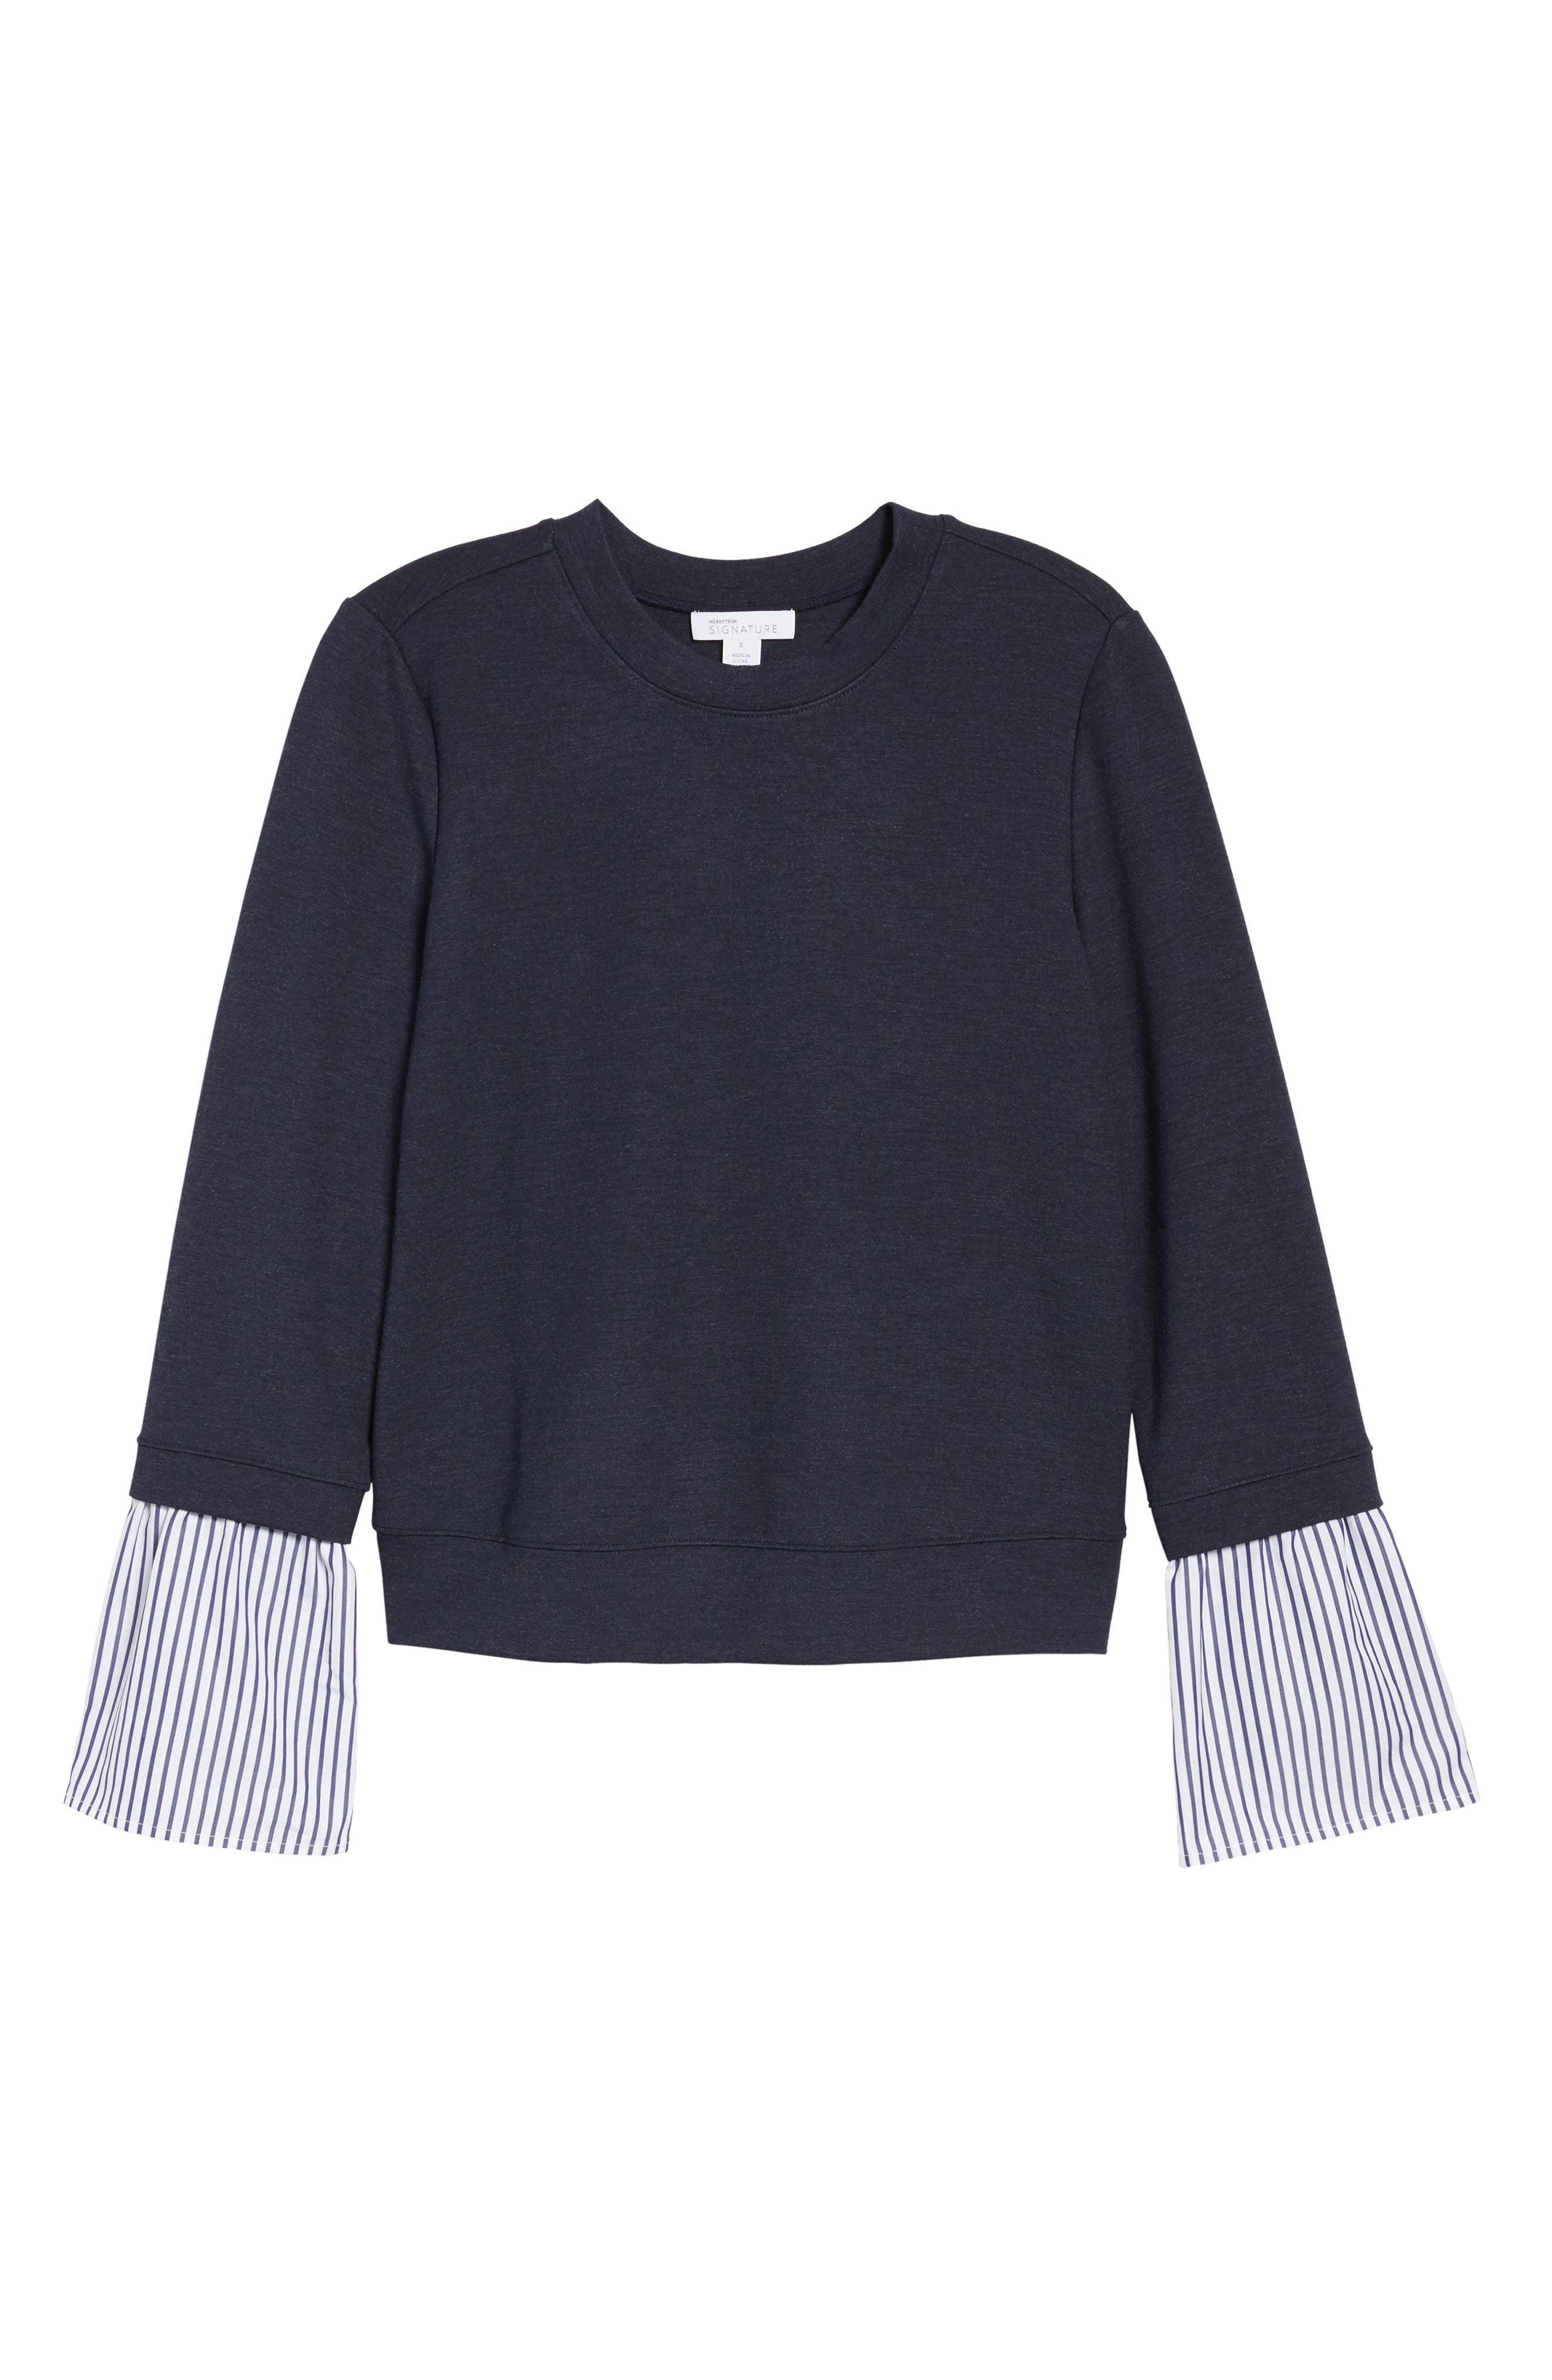 Poplin & Lace Crewneck Sweatshirt,                             Alternate thumbnail 6, color,                             Navy Night